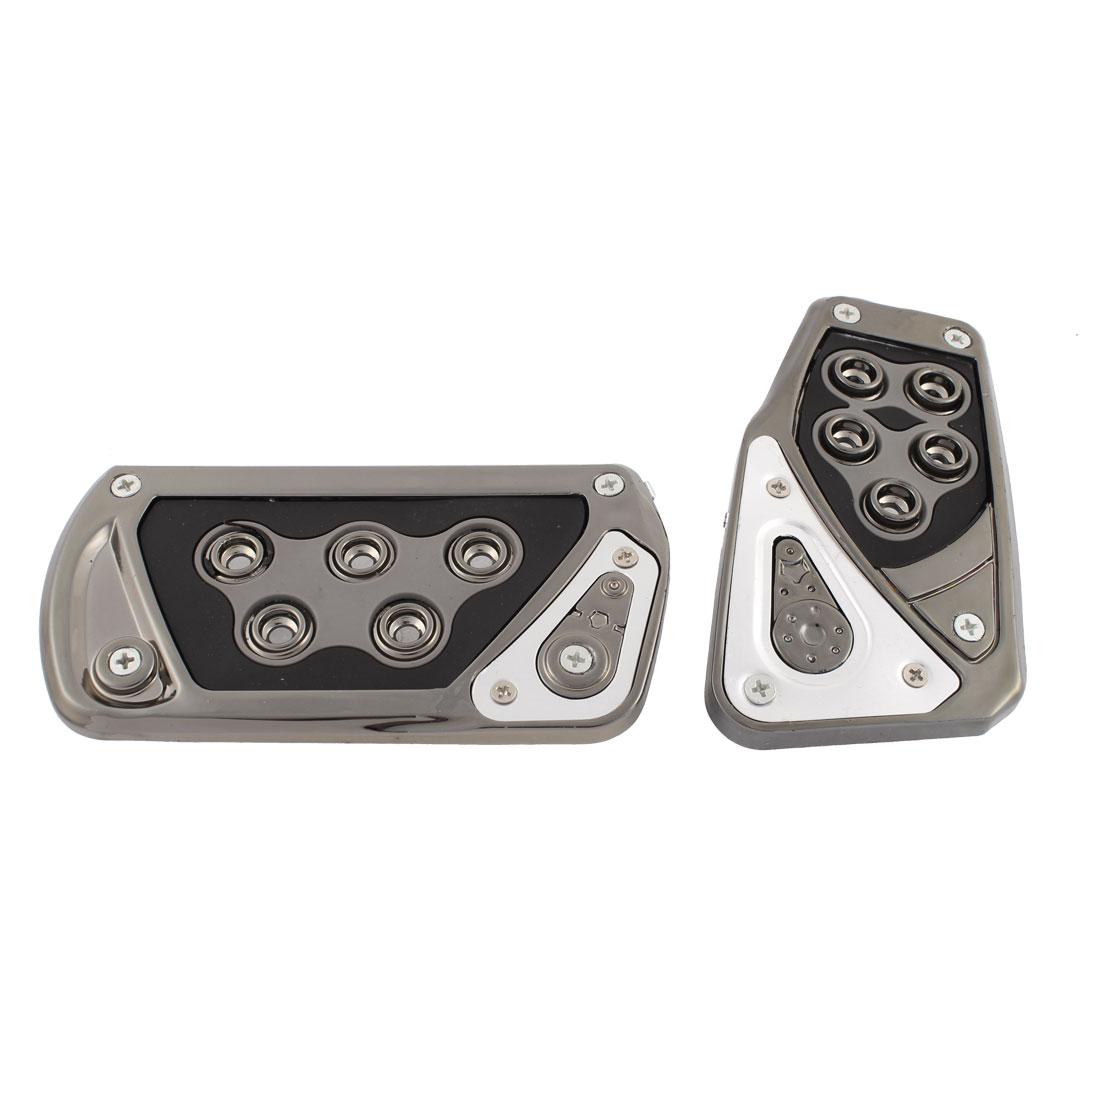 2 in 1 Manual Car Antislip Clutch Brake Gas Pedal Pad Kit Set Black Sliver Tone